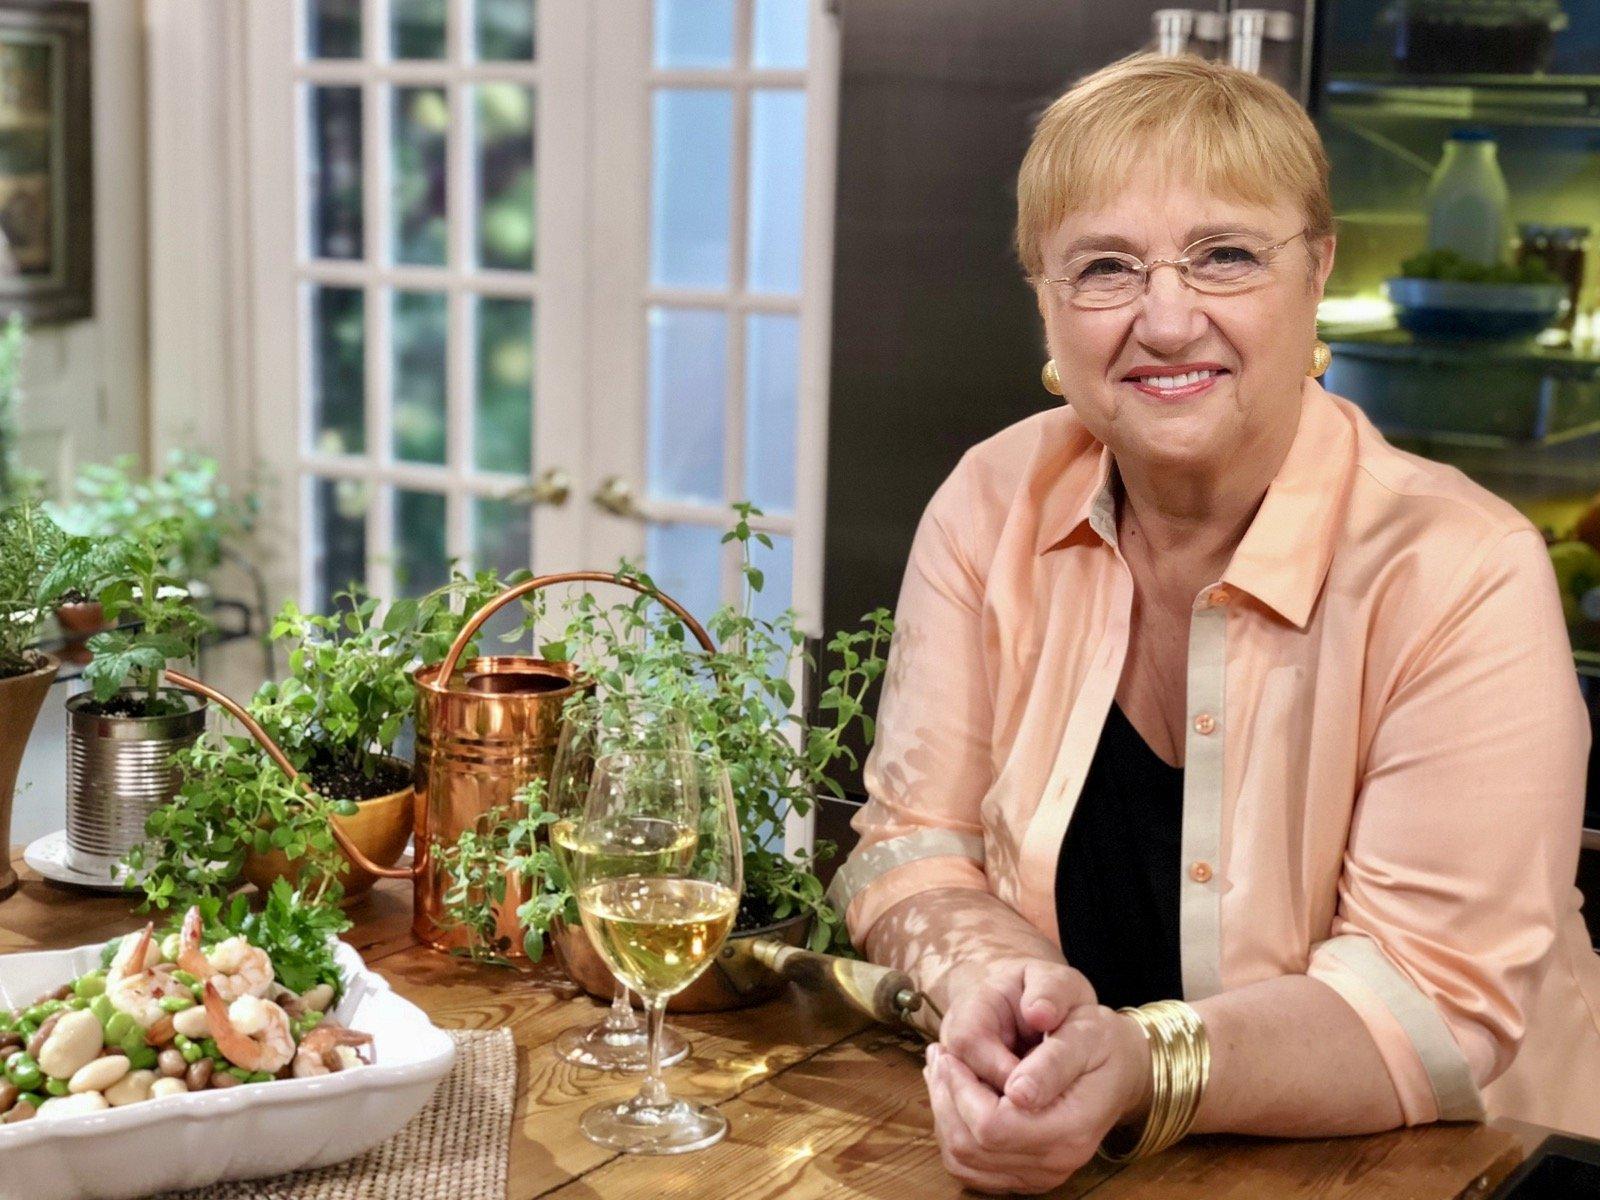 Programmi Tv Di Cucina Americani a lidia bastianich, da vent'anni ambasciatrice della cucina